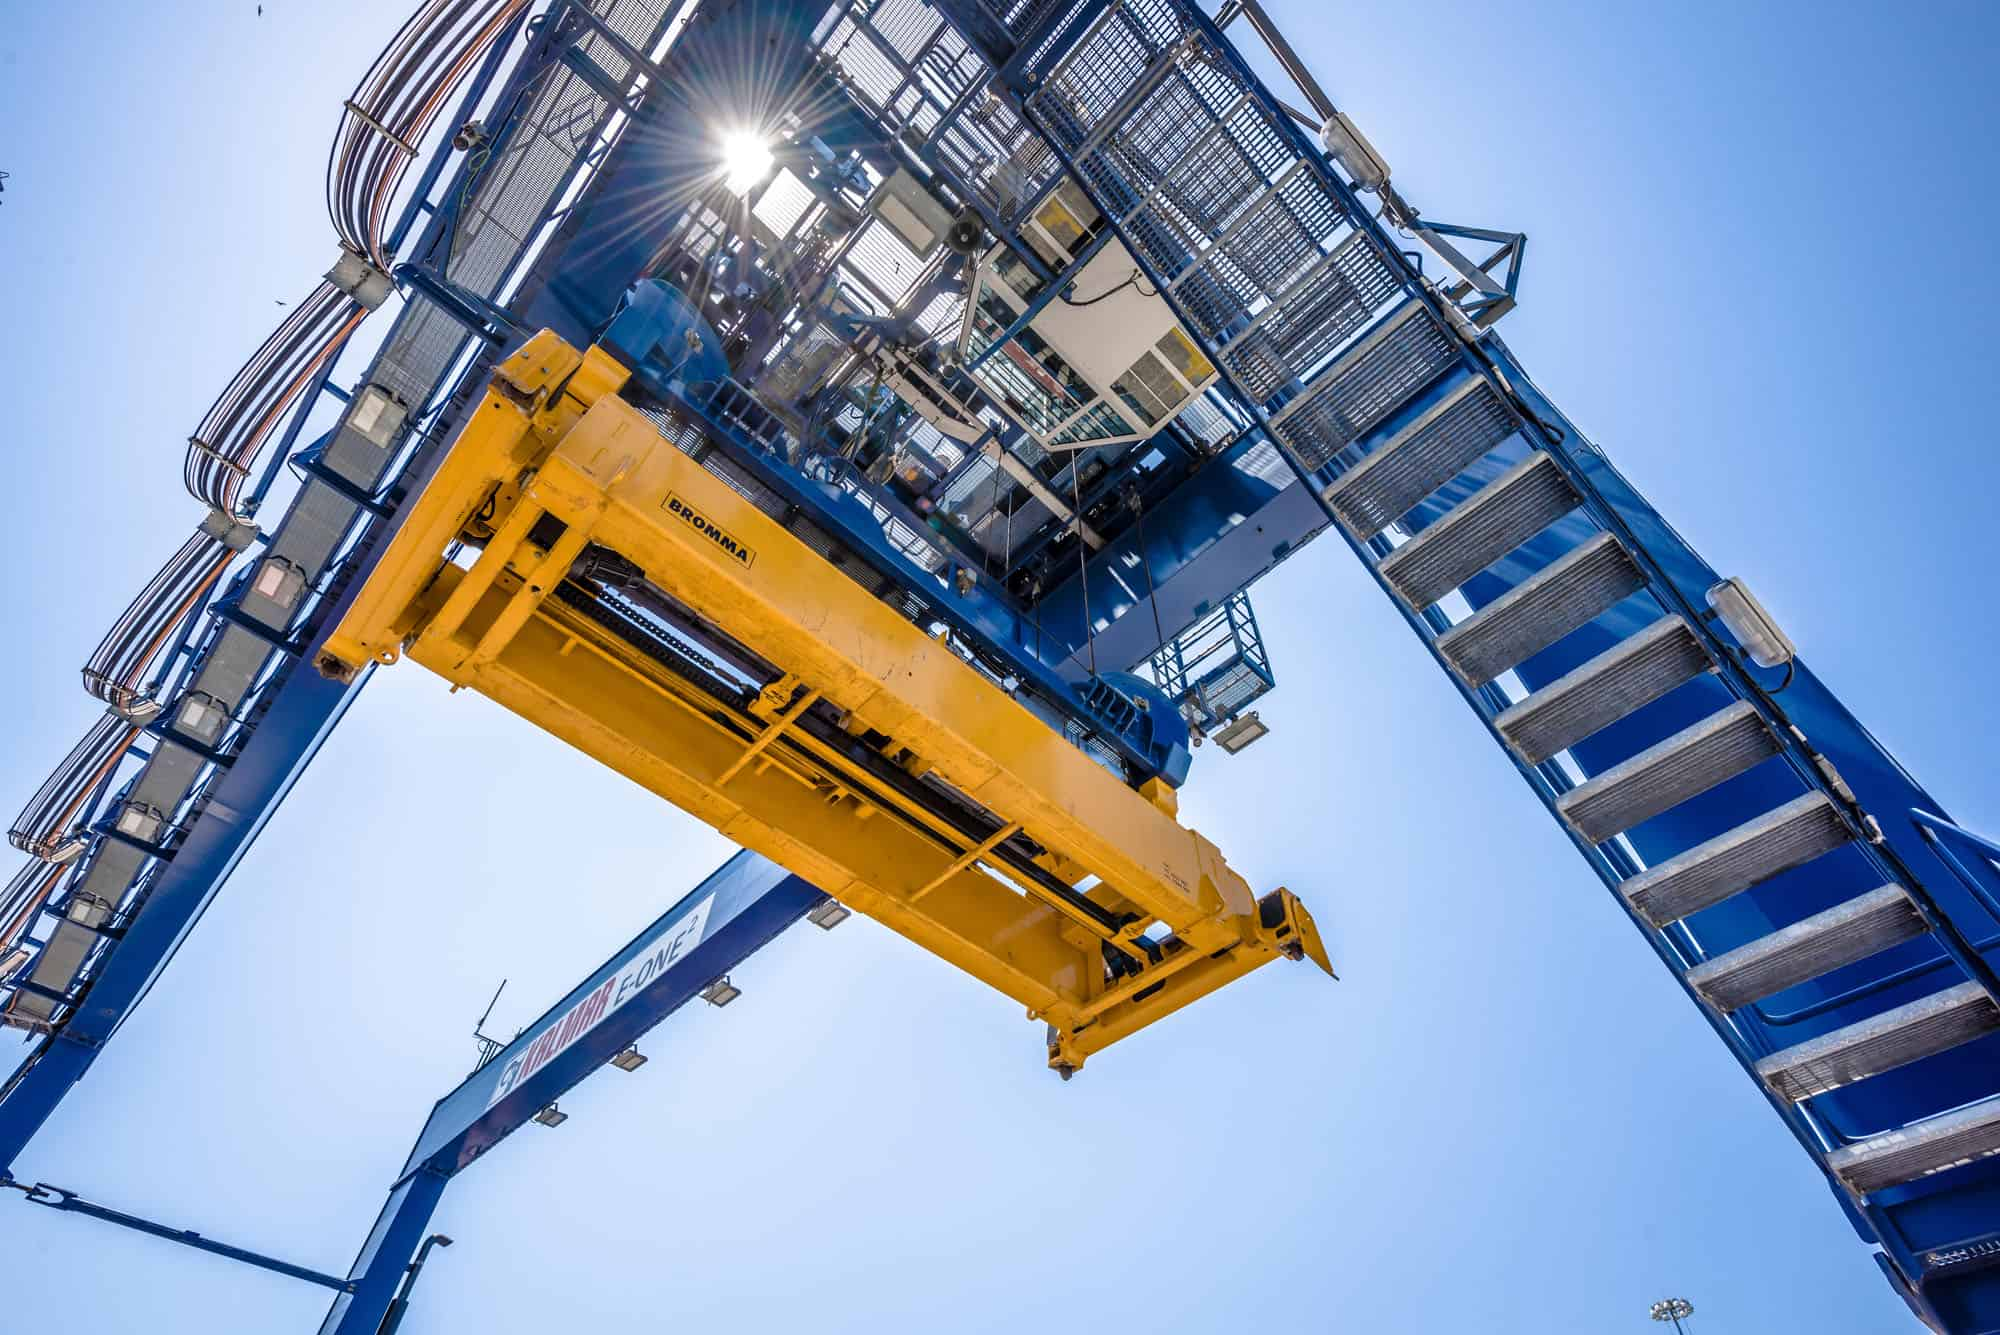 Dar es Salaam port to receive six RTGs